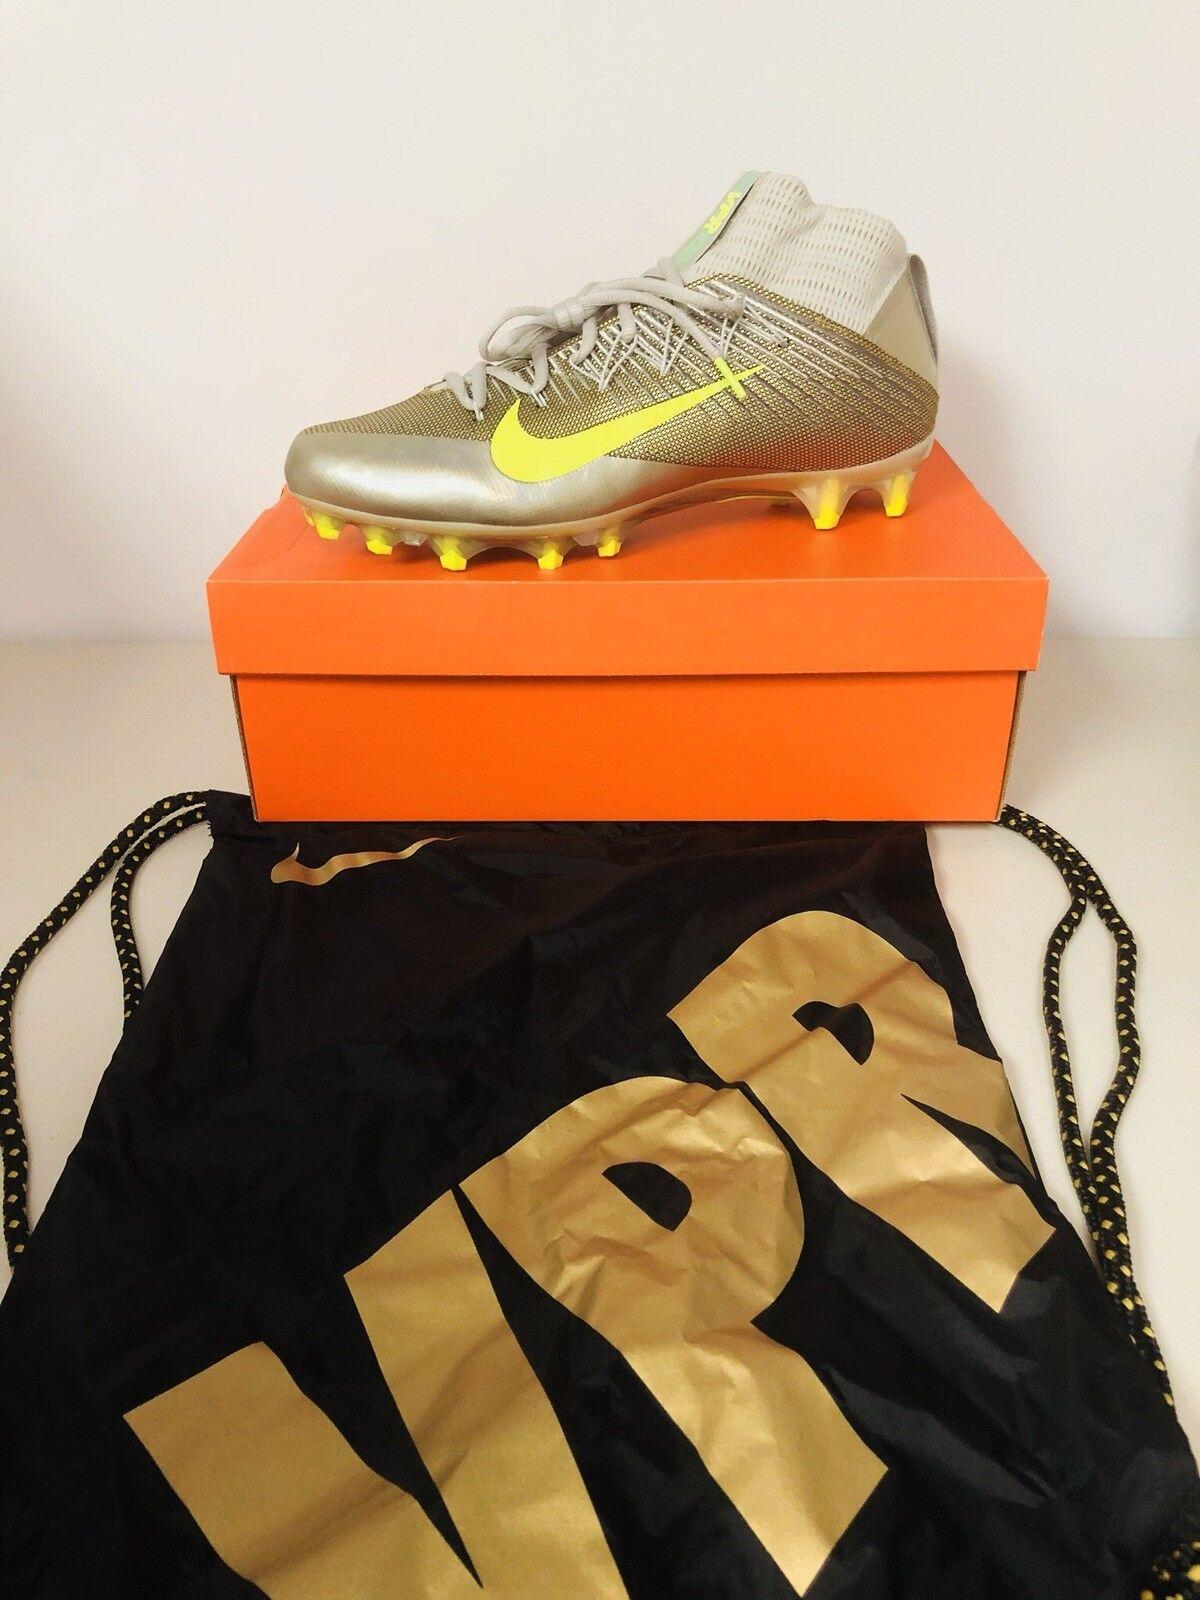 NIB Nike Vapor Untouchable 2 Men's Size 12 Metallic Football Cleats 824470-010